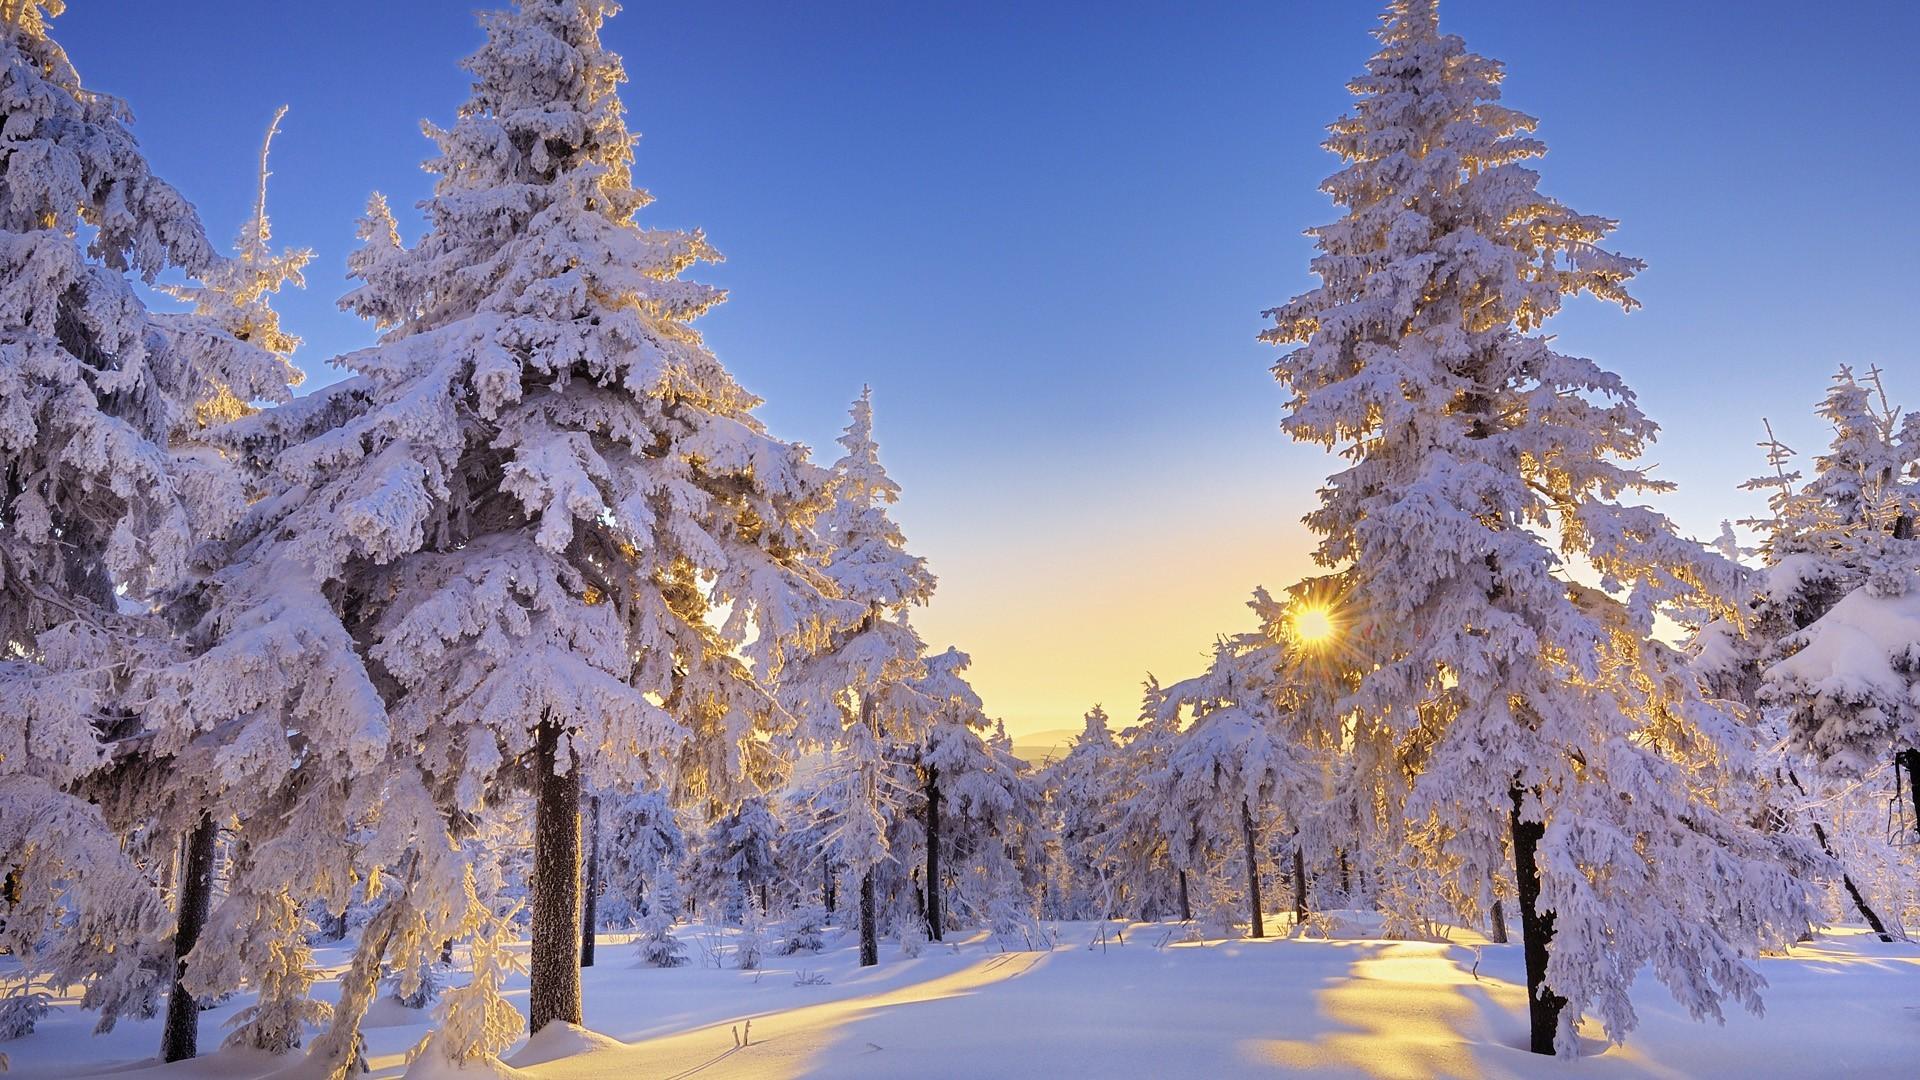 Winter Snow Wallpaper Winter, Snow, Trees, Germany